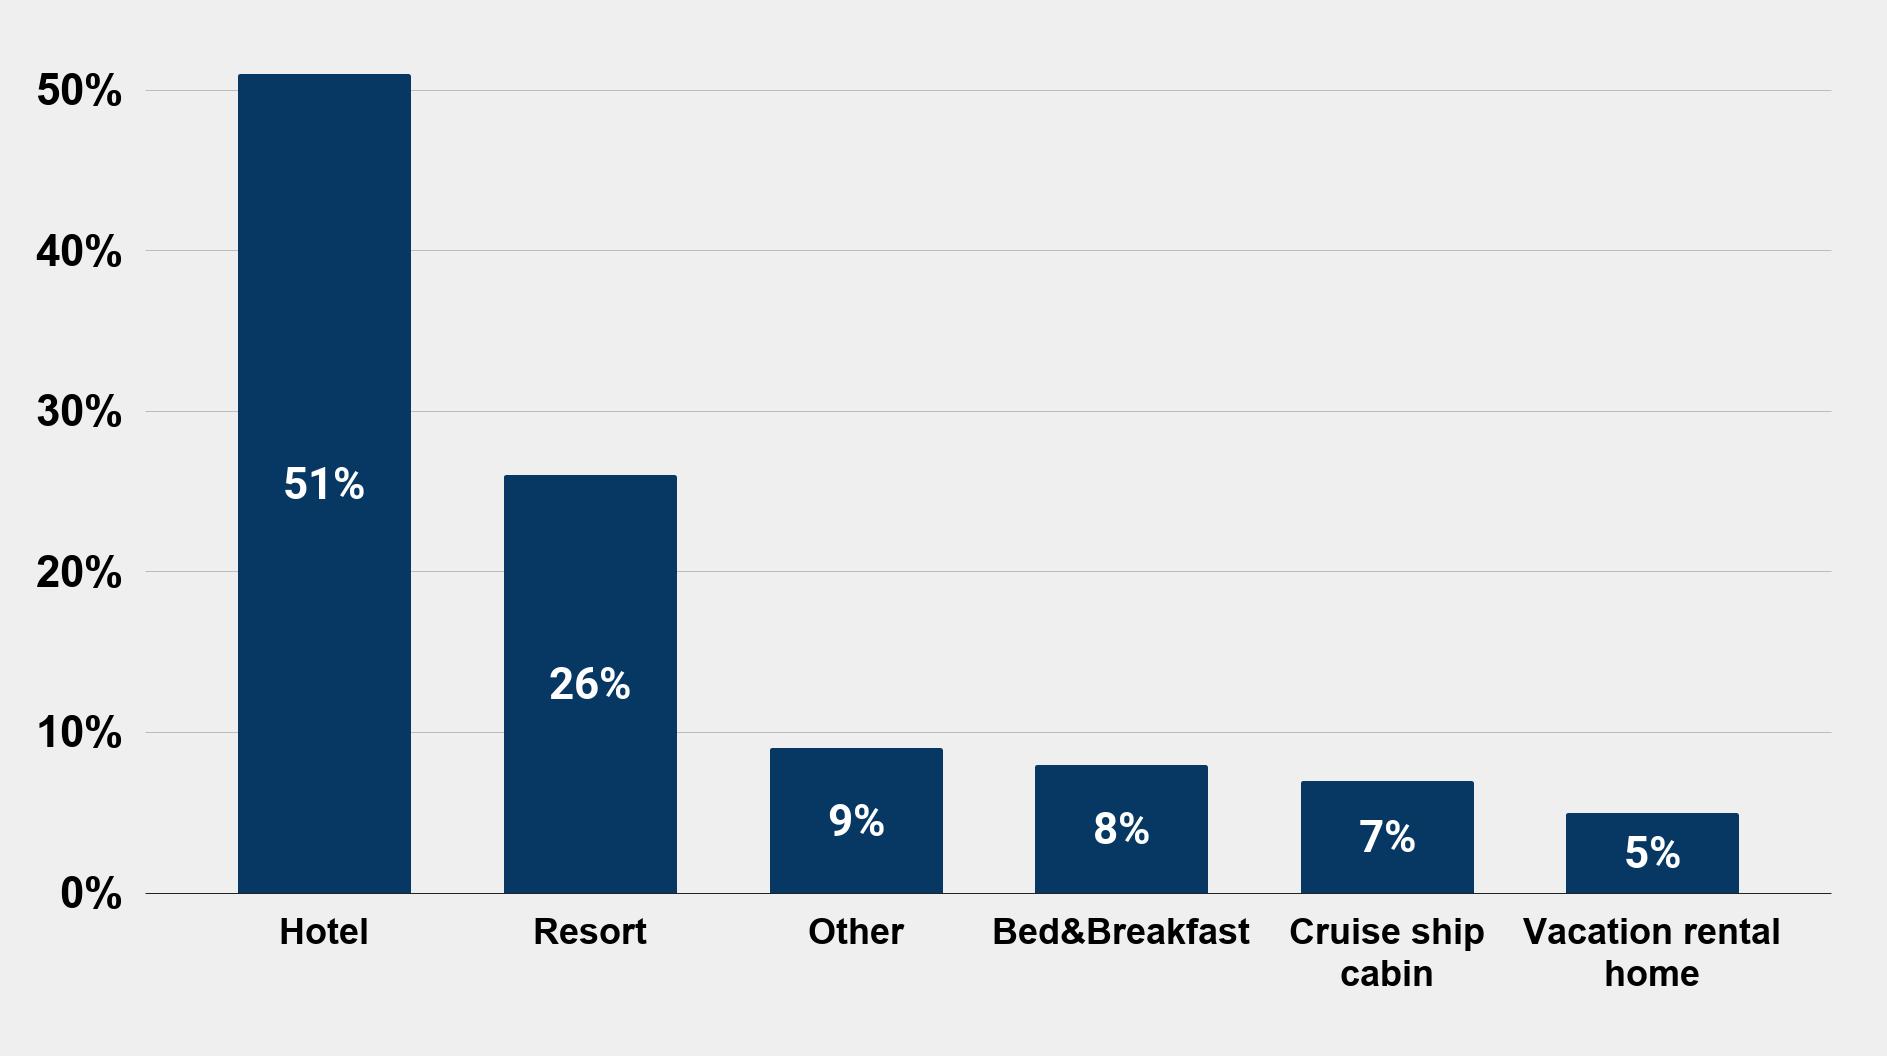 Most popular accomodation option for romantic getaway (Nov. 2014) Graphs Charts Stats